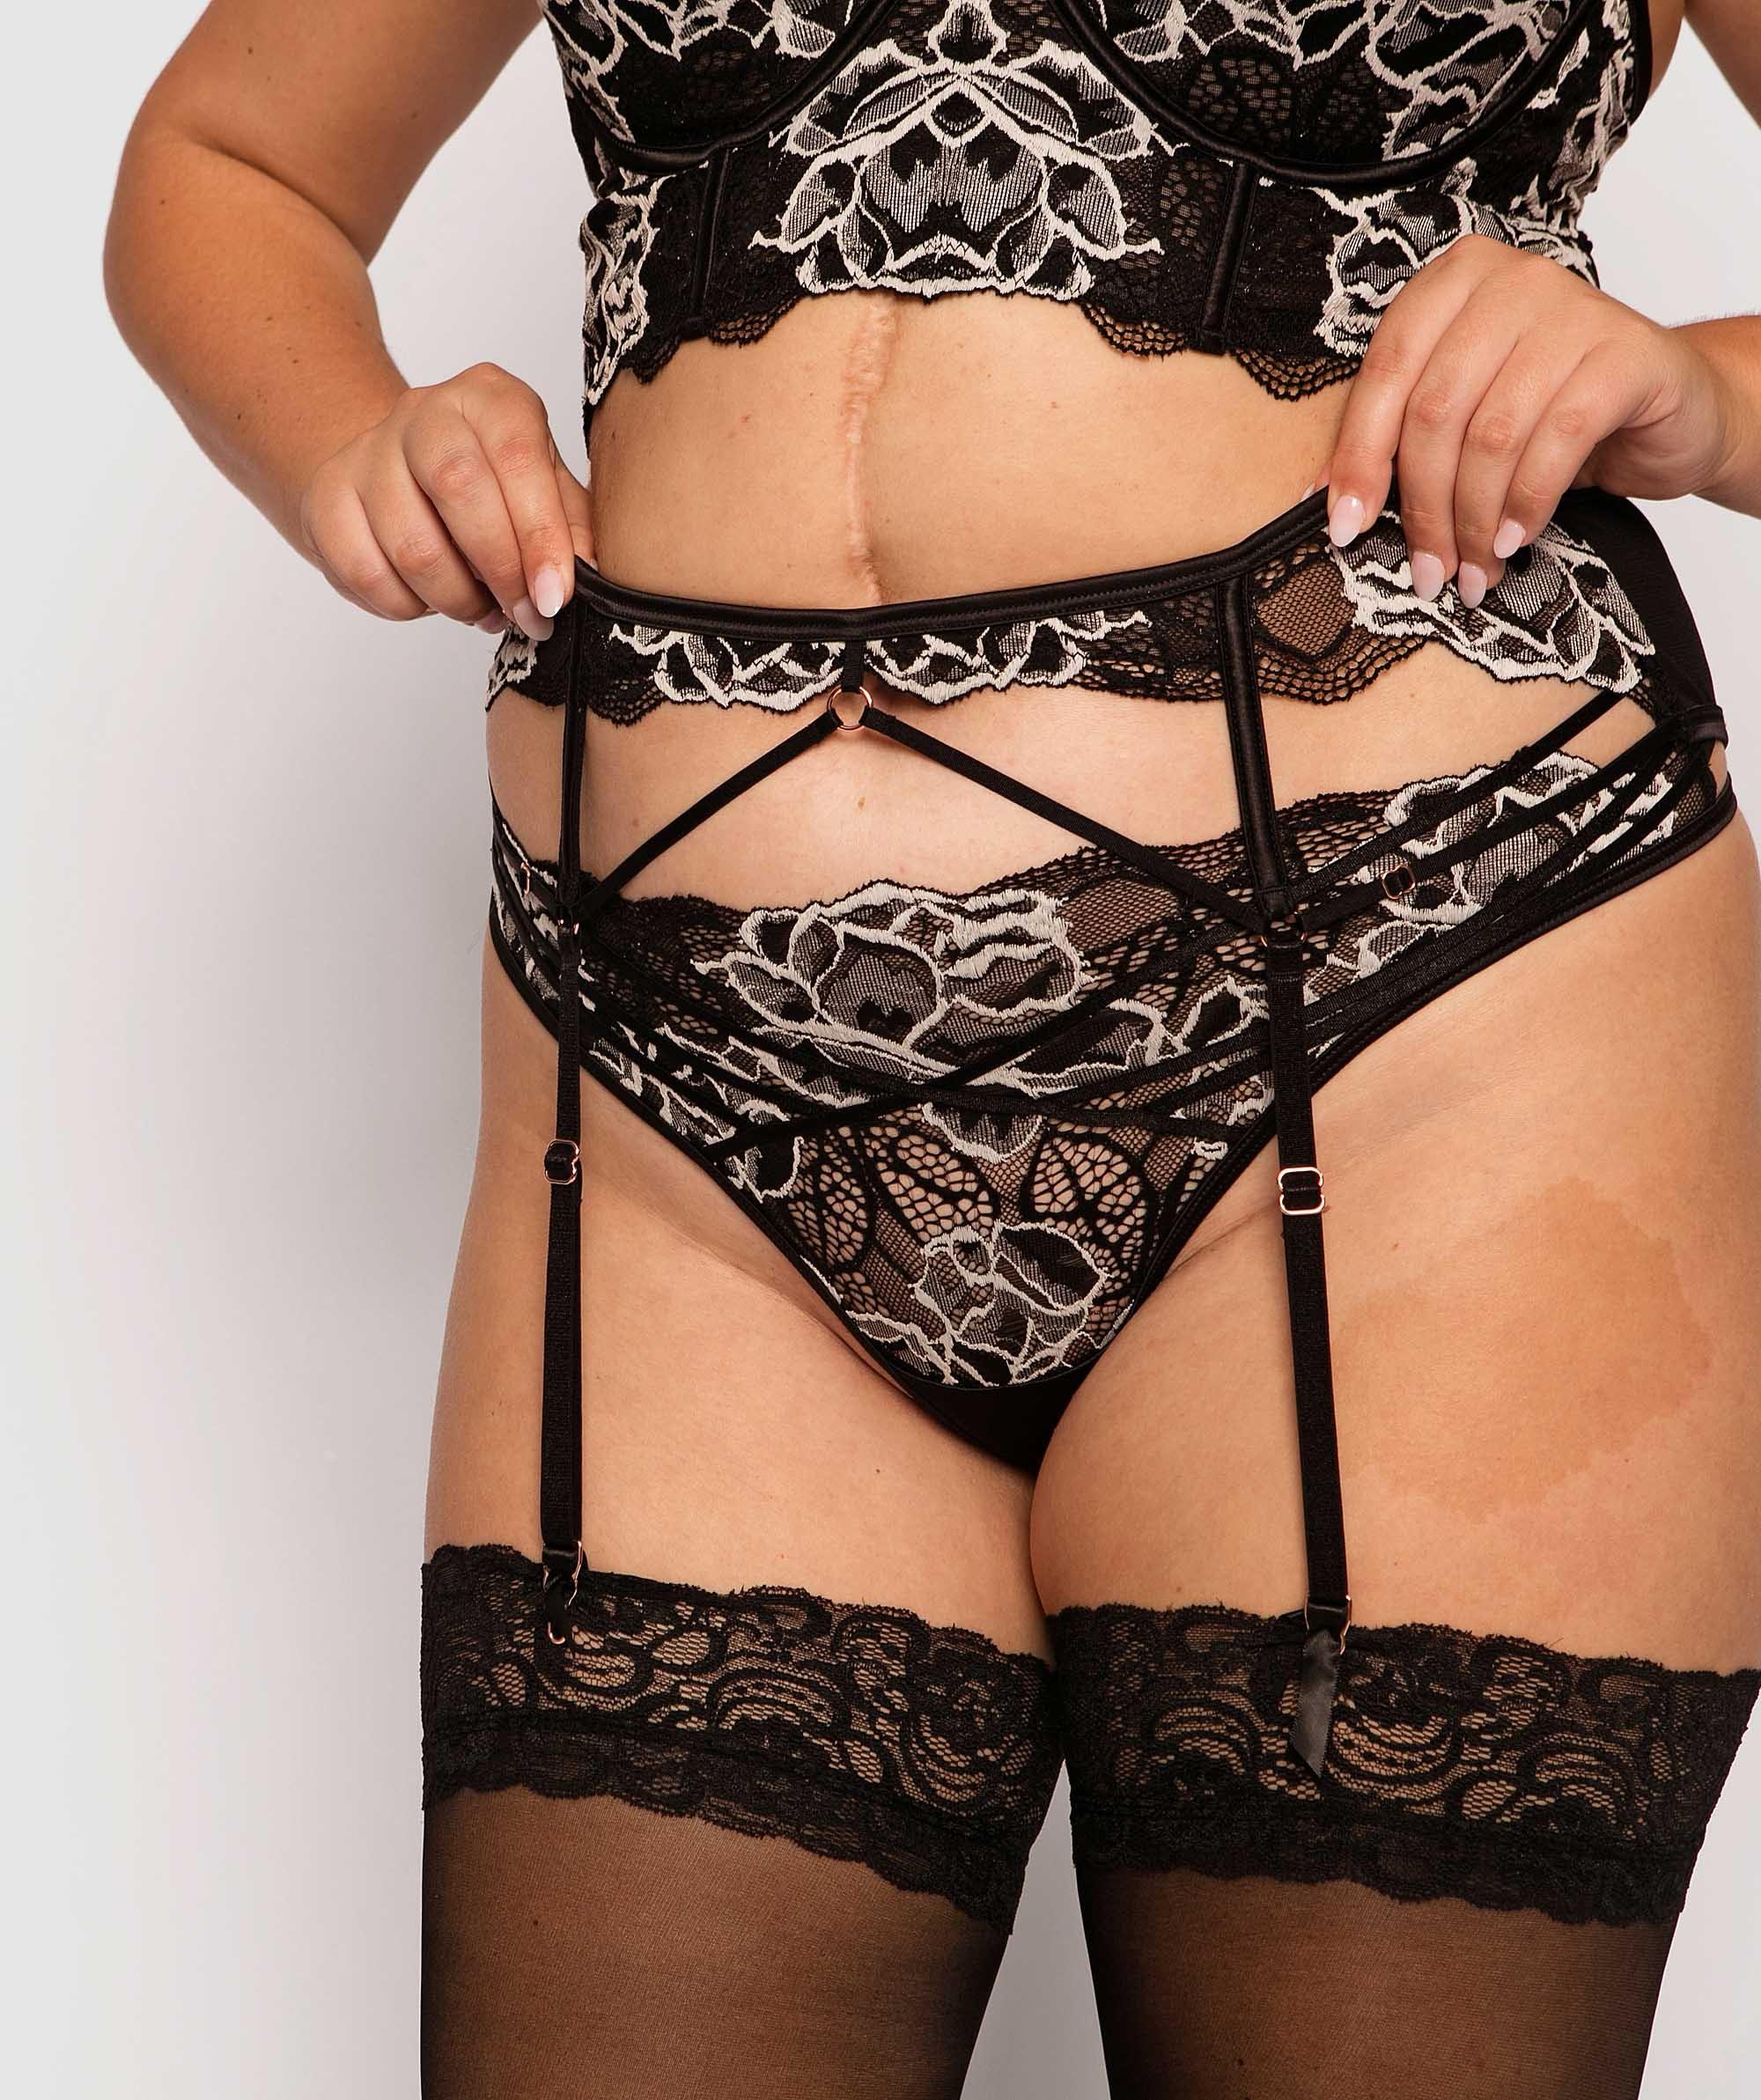 Enchanted La Rochelle Suspender - Black/White